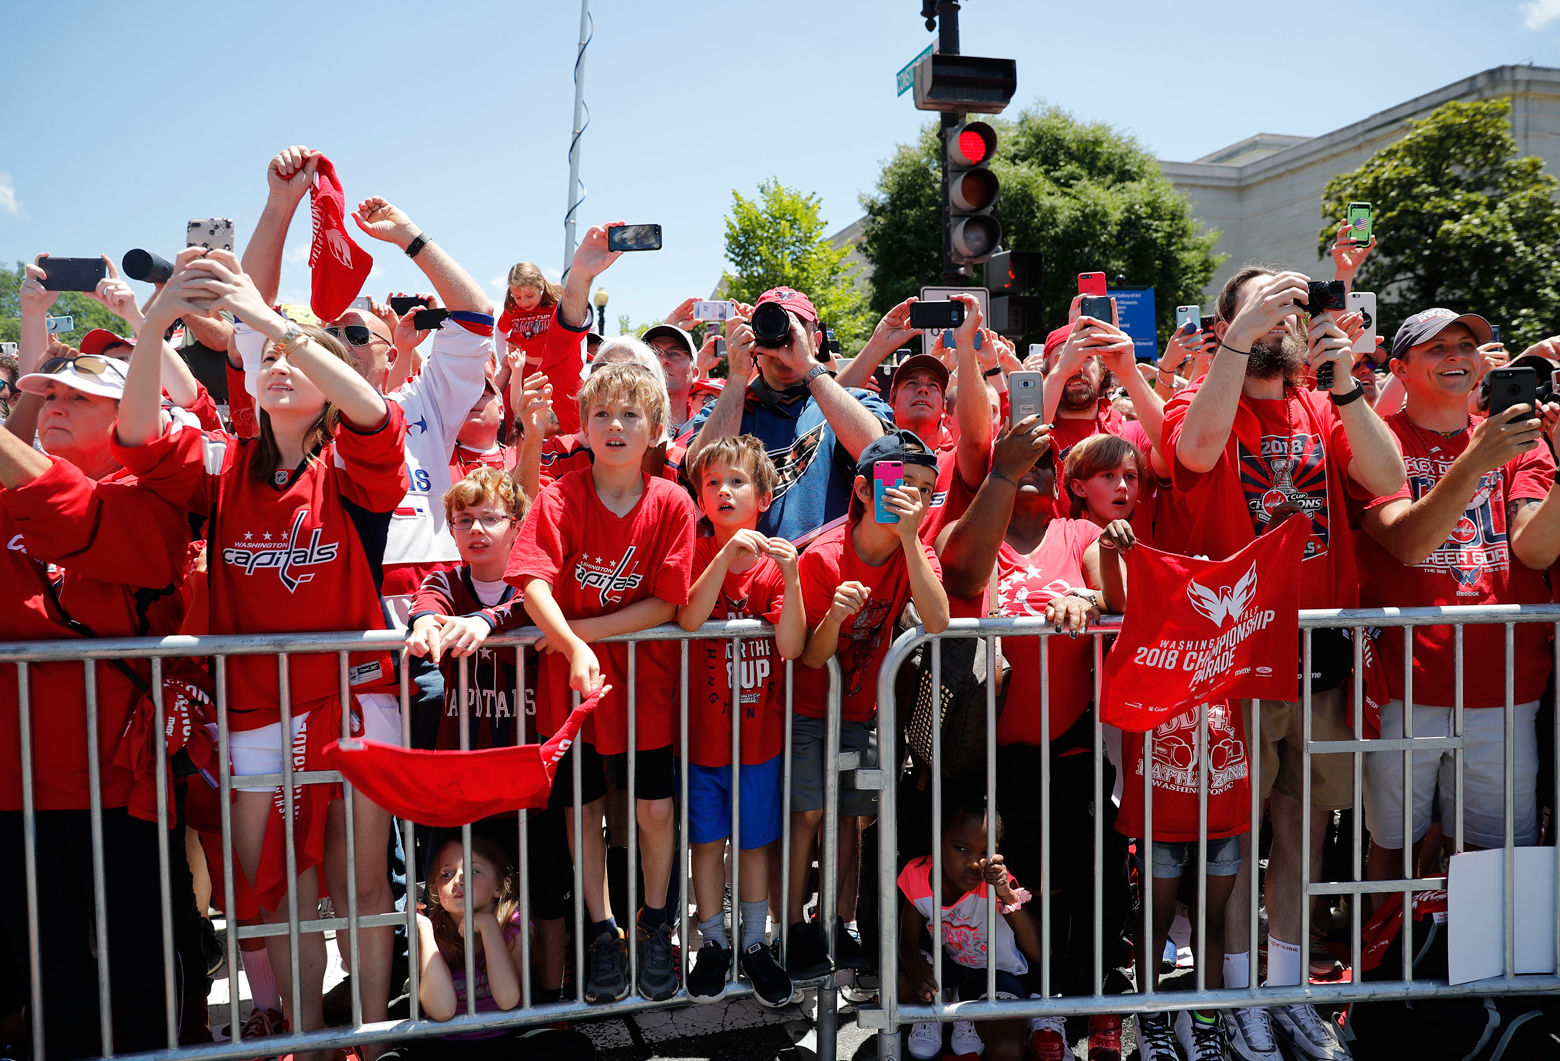 Fans react to the bus going past. (AP Photo/Pablo Martinez Monsivais)